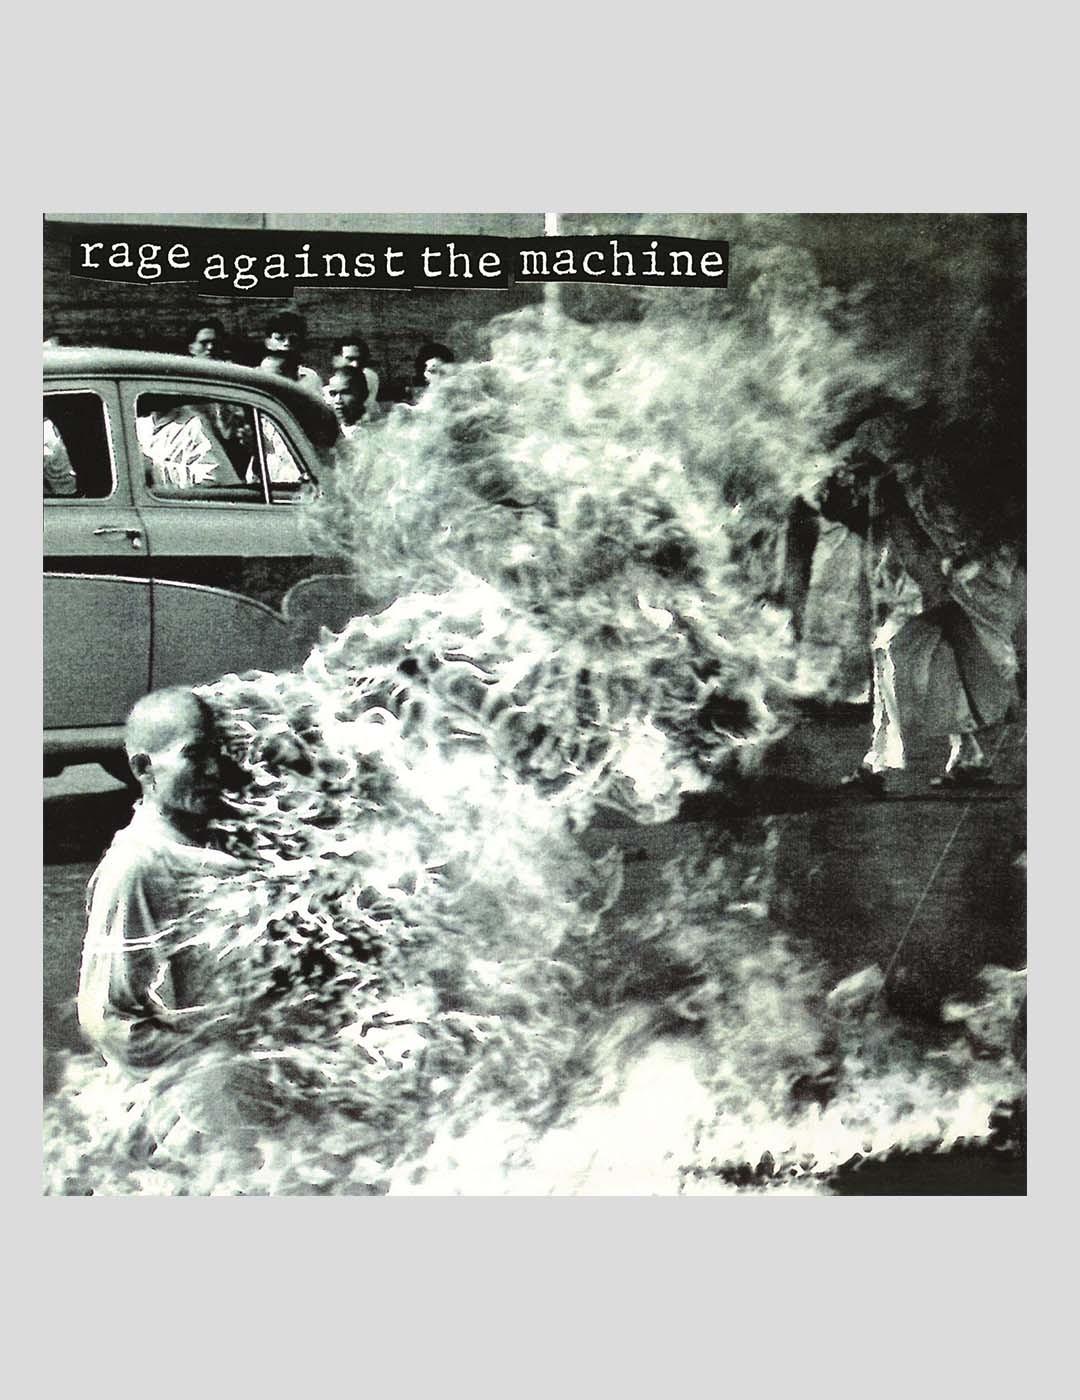 VINILO RAGE AGAINST THE MACHINE - RAGE AGAINST THE MACHINE LP VINYL